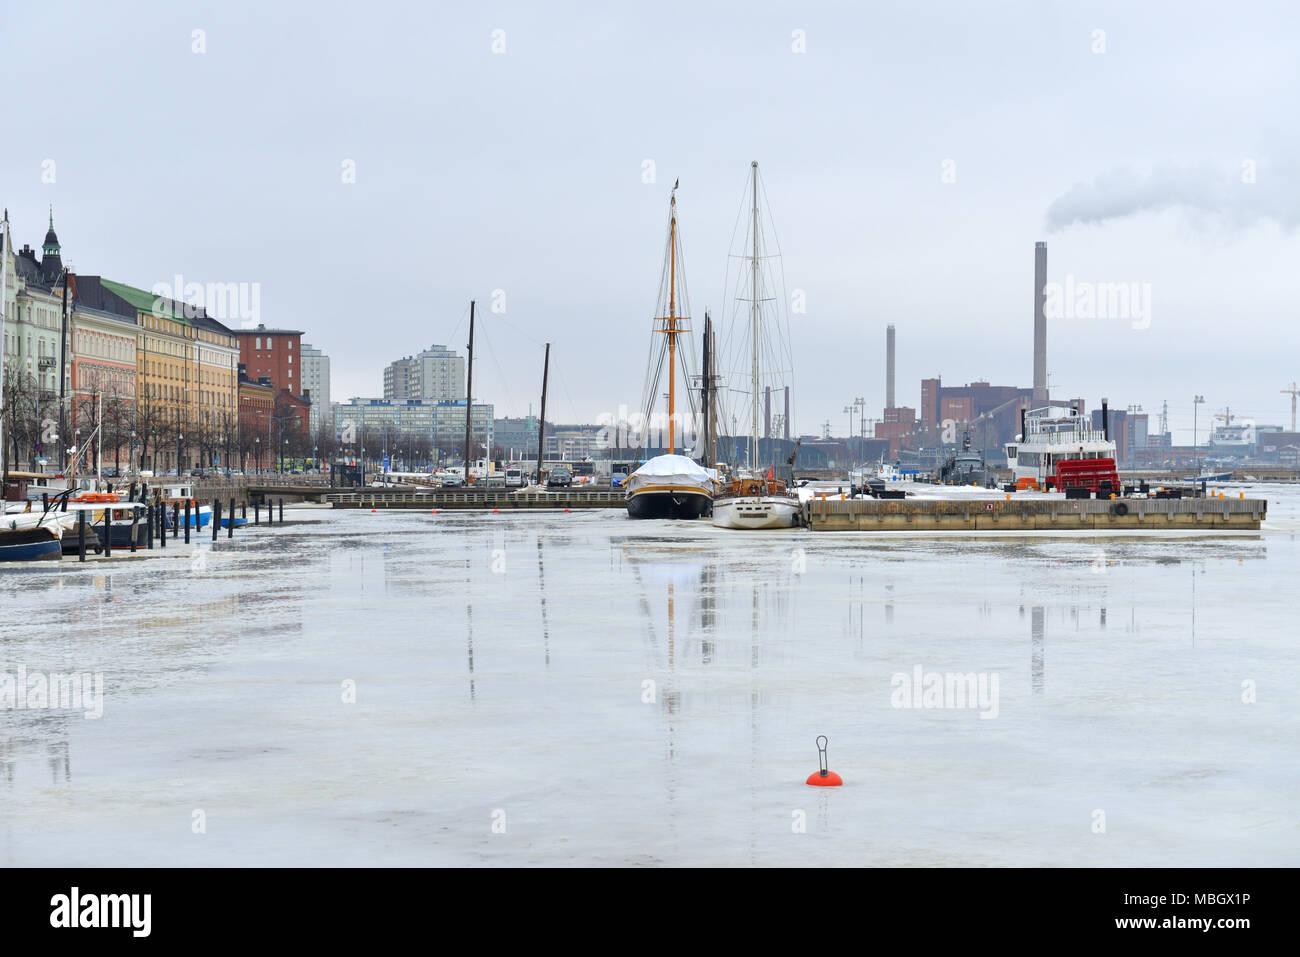 Gloomy spring day. Pohjoisranta embankment and harbor - Stock Image